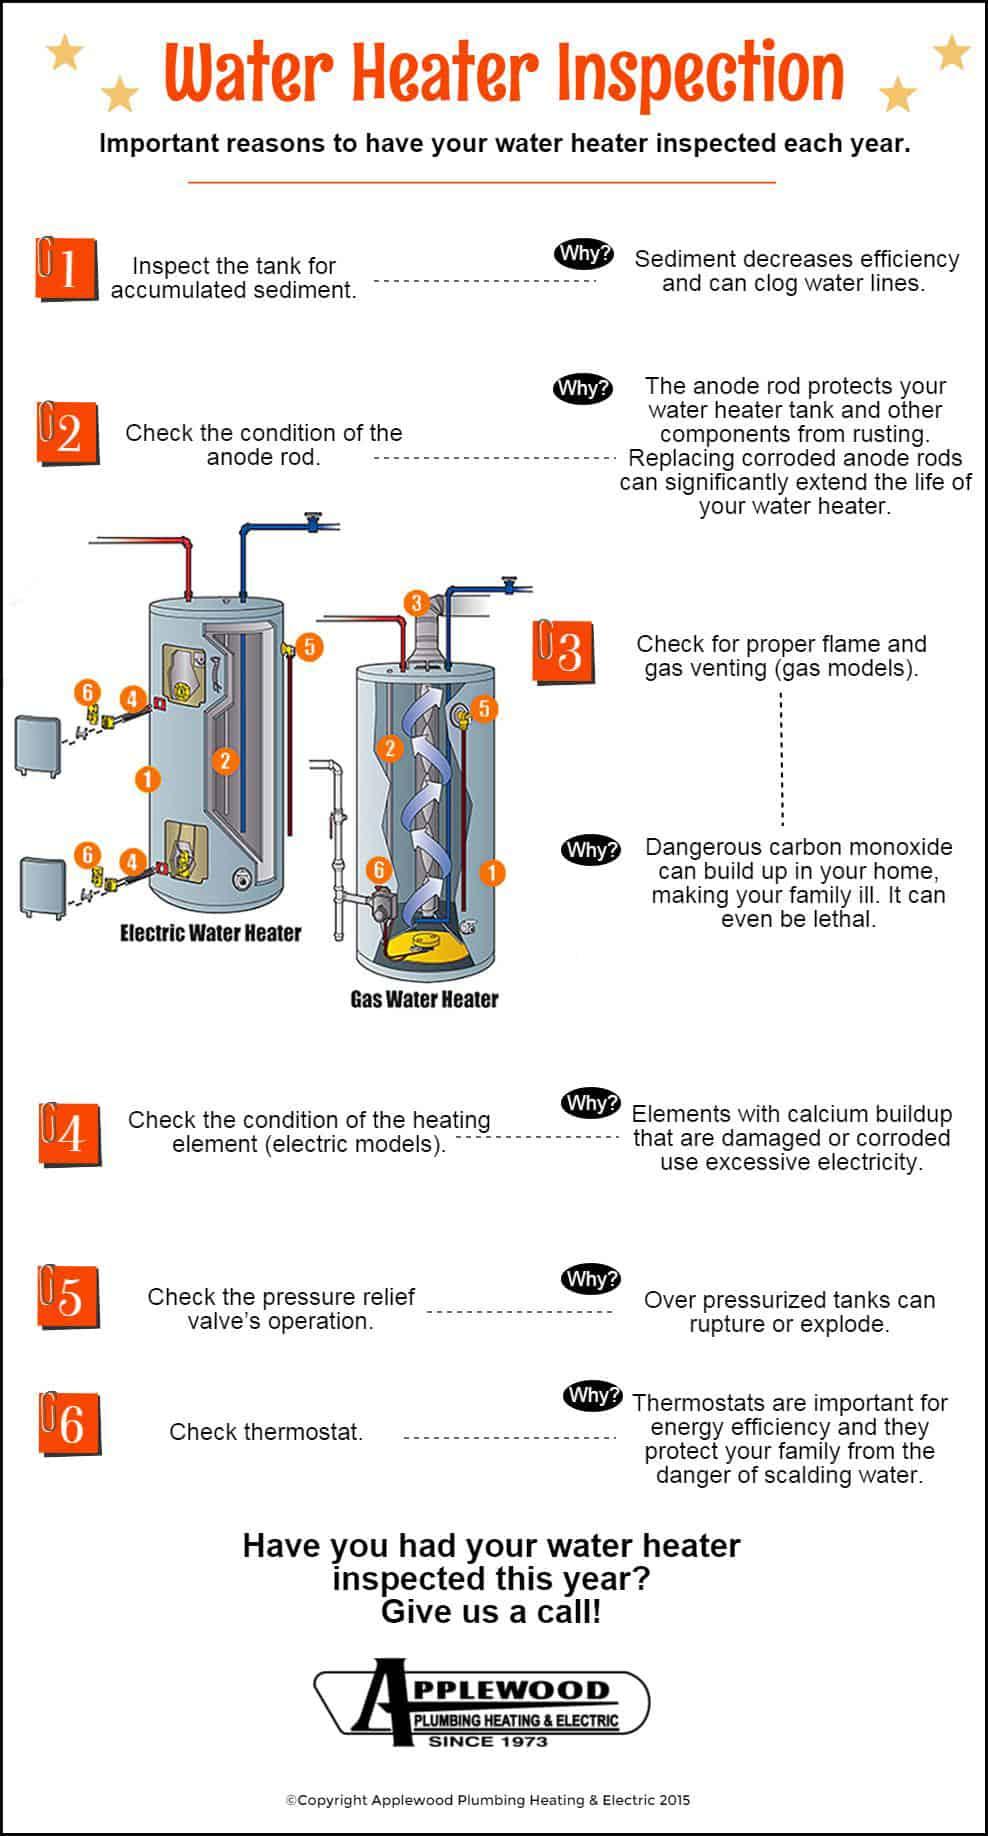 Water Heater Inspection_final